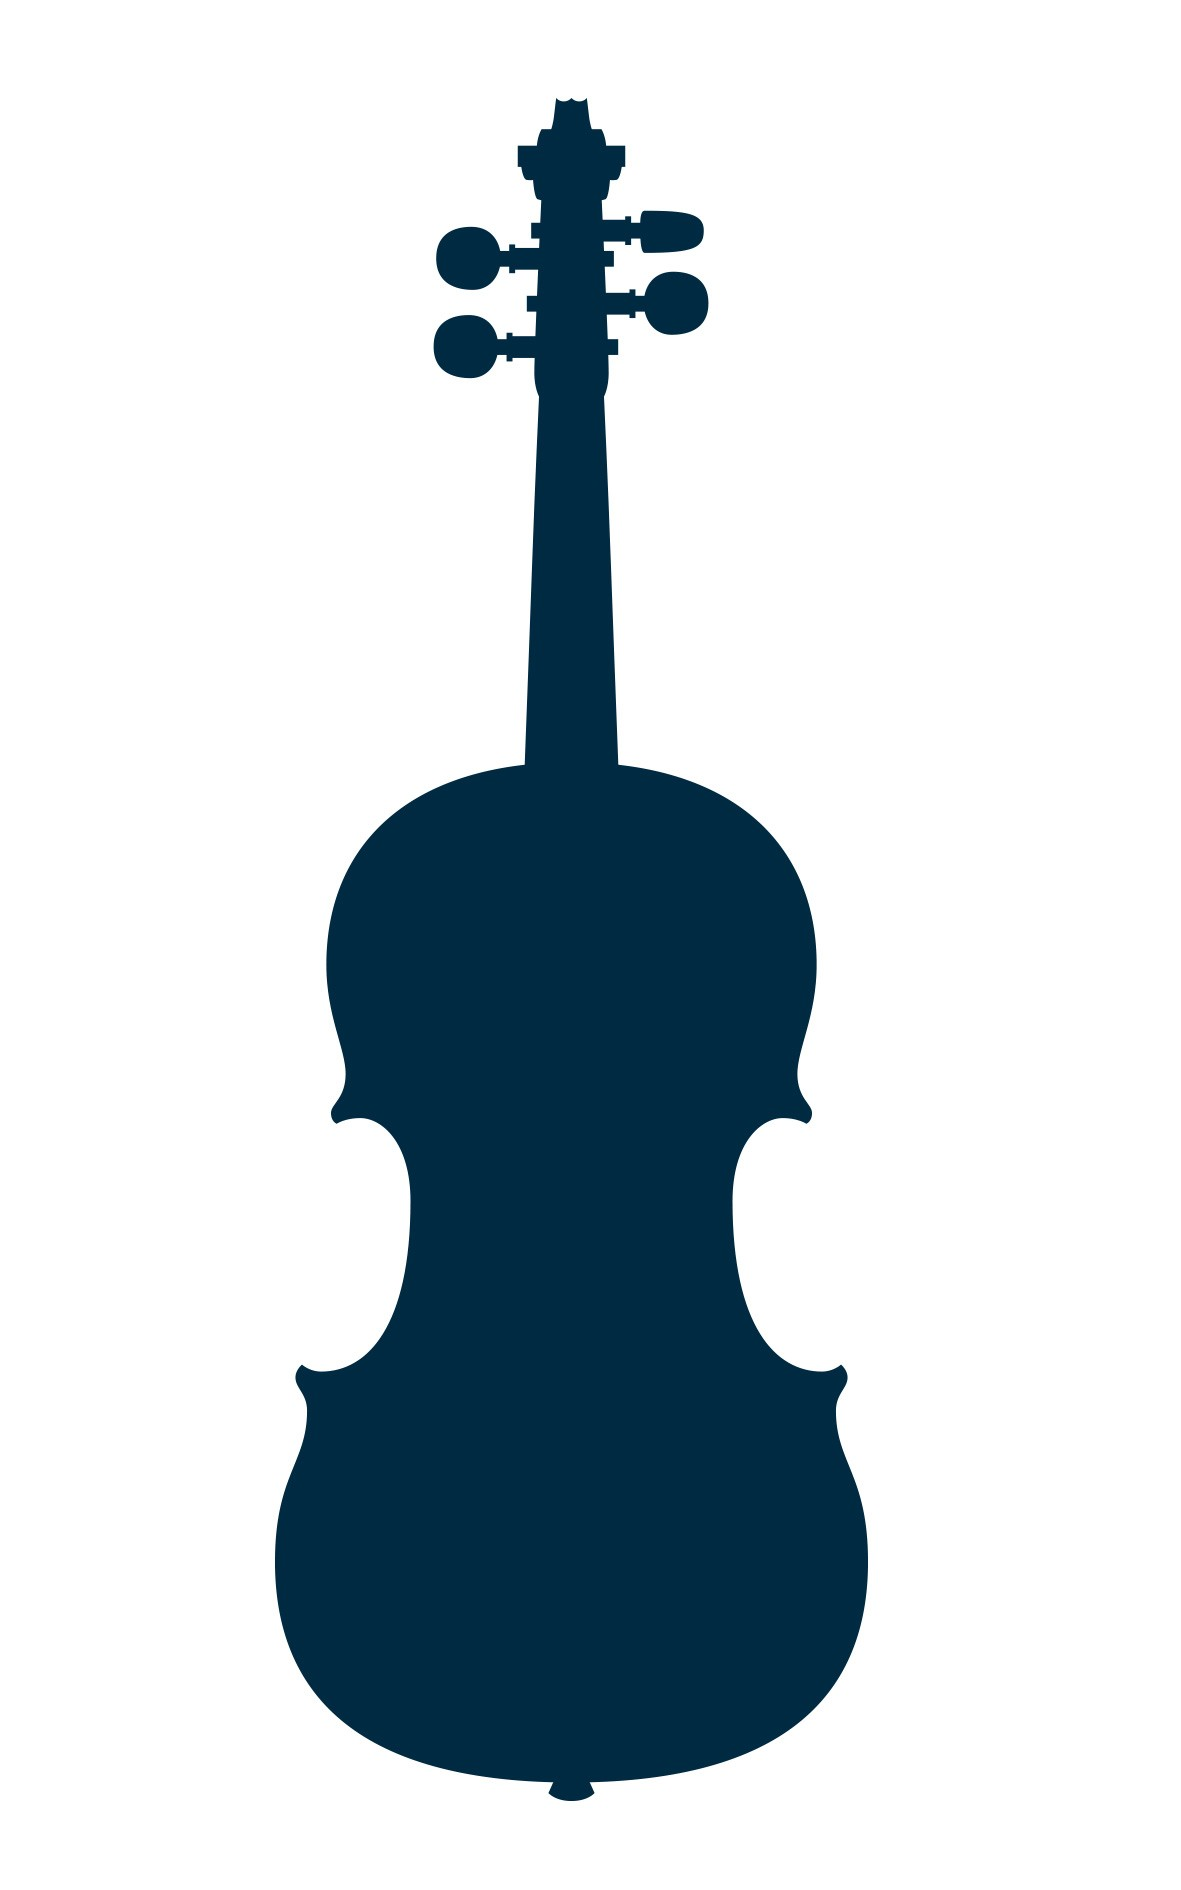 Modern Italian violin by Raffaele Scalise